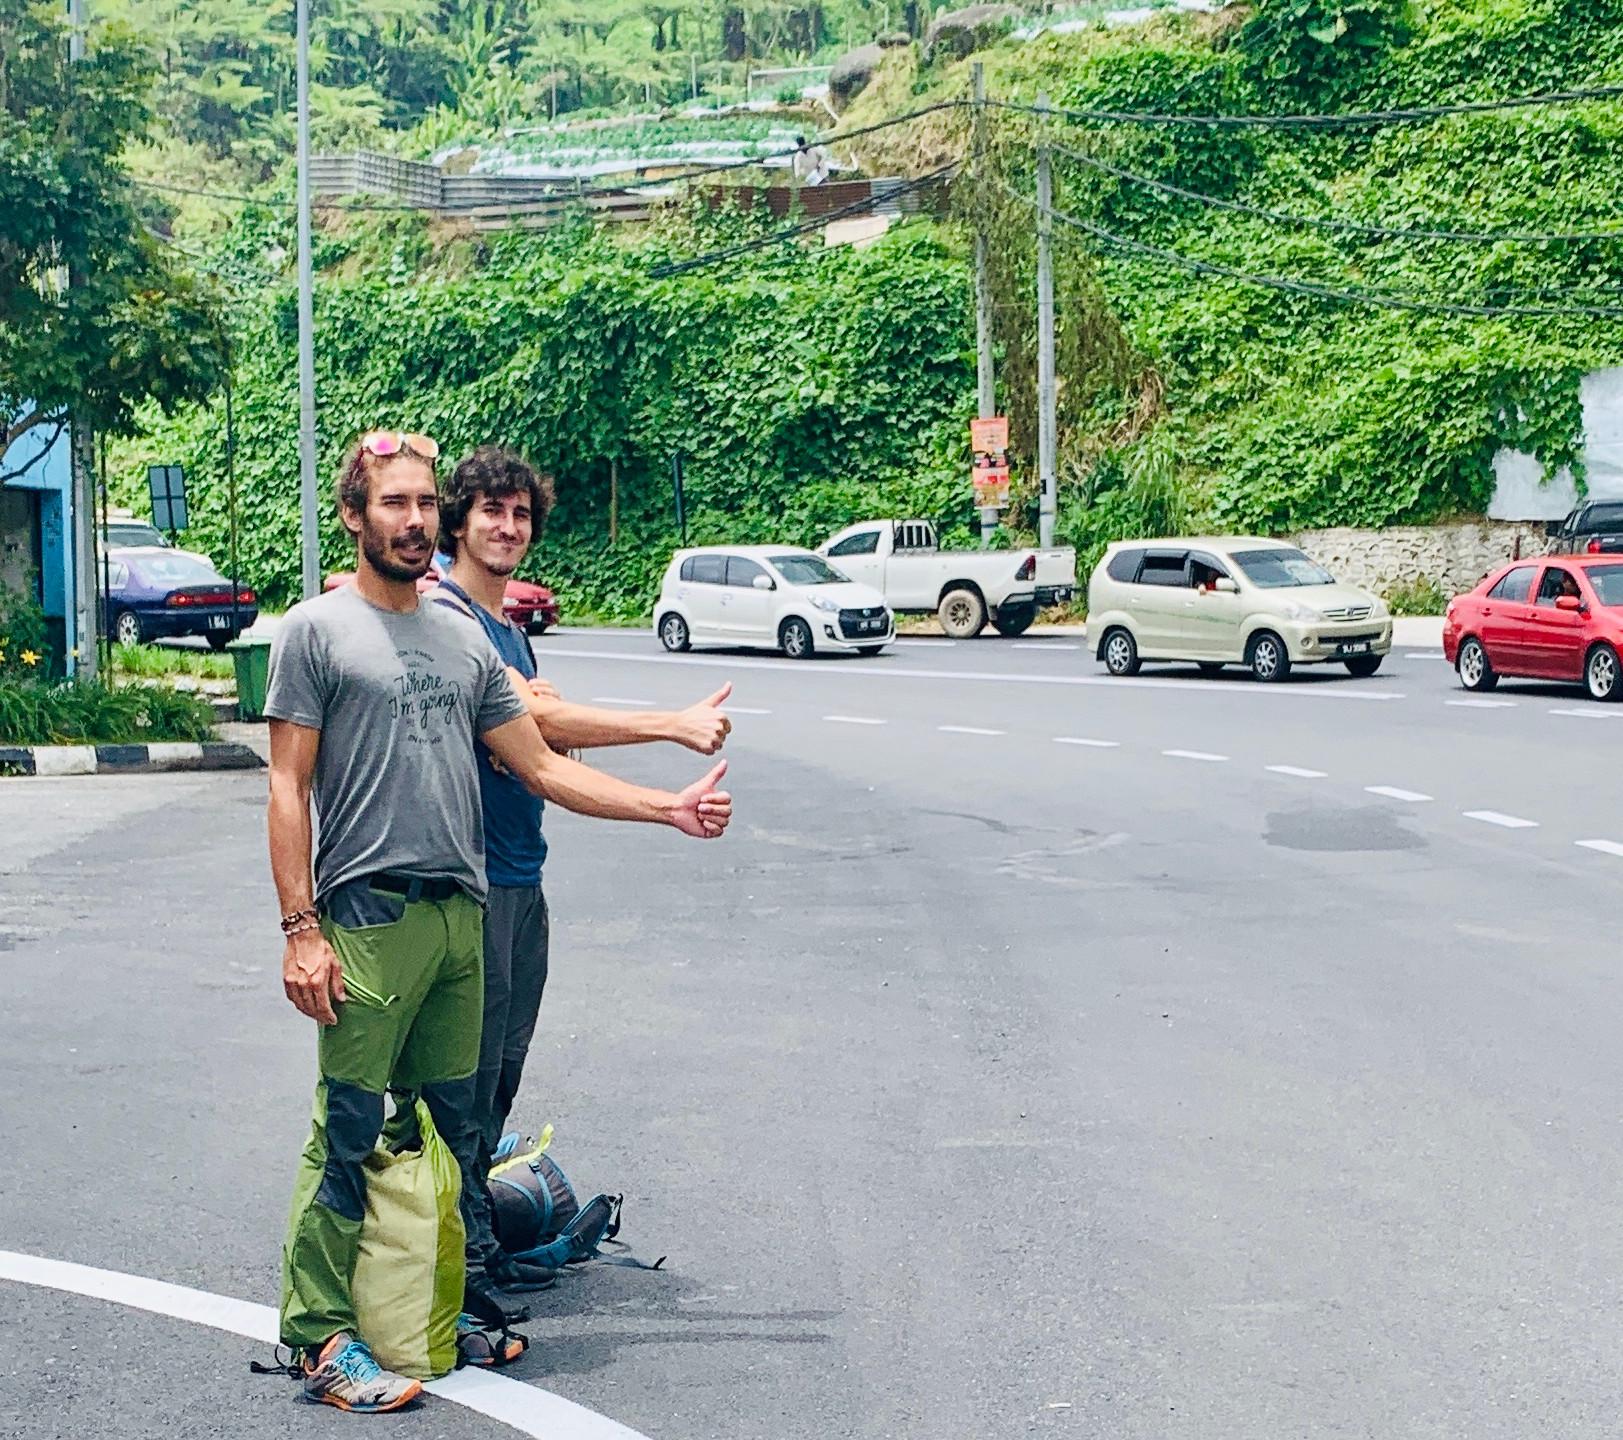 En mode autostop